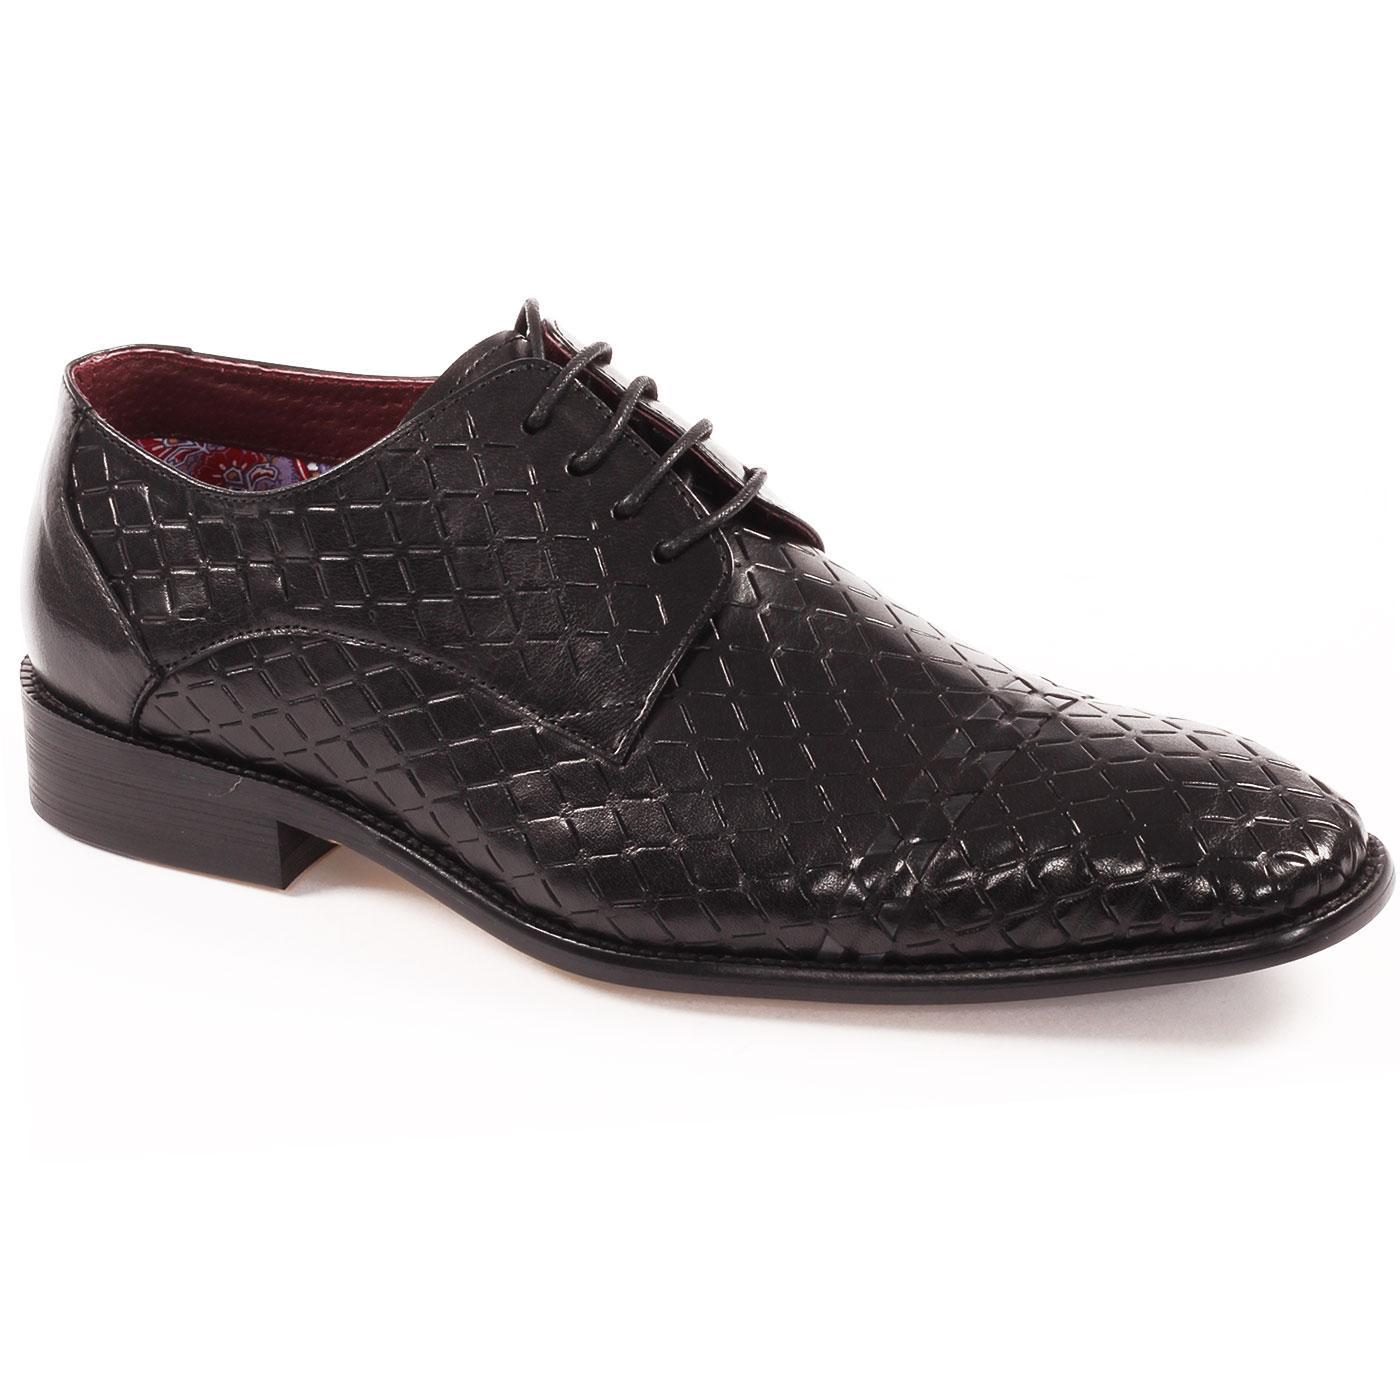 Enoch PAOLO VANDINI Diamond Weave Derby Shoes (B)